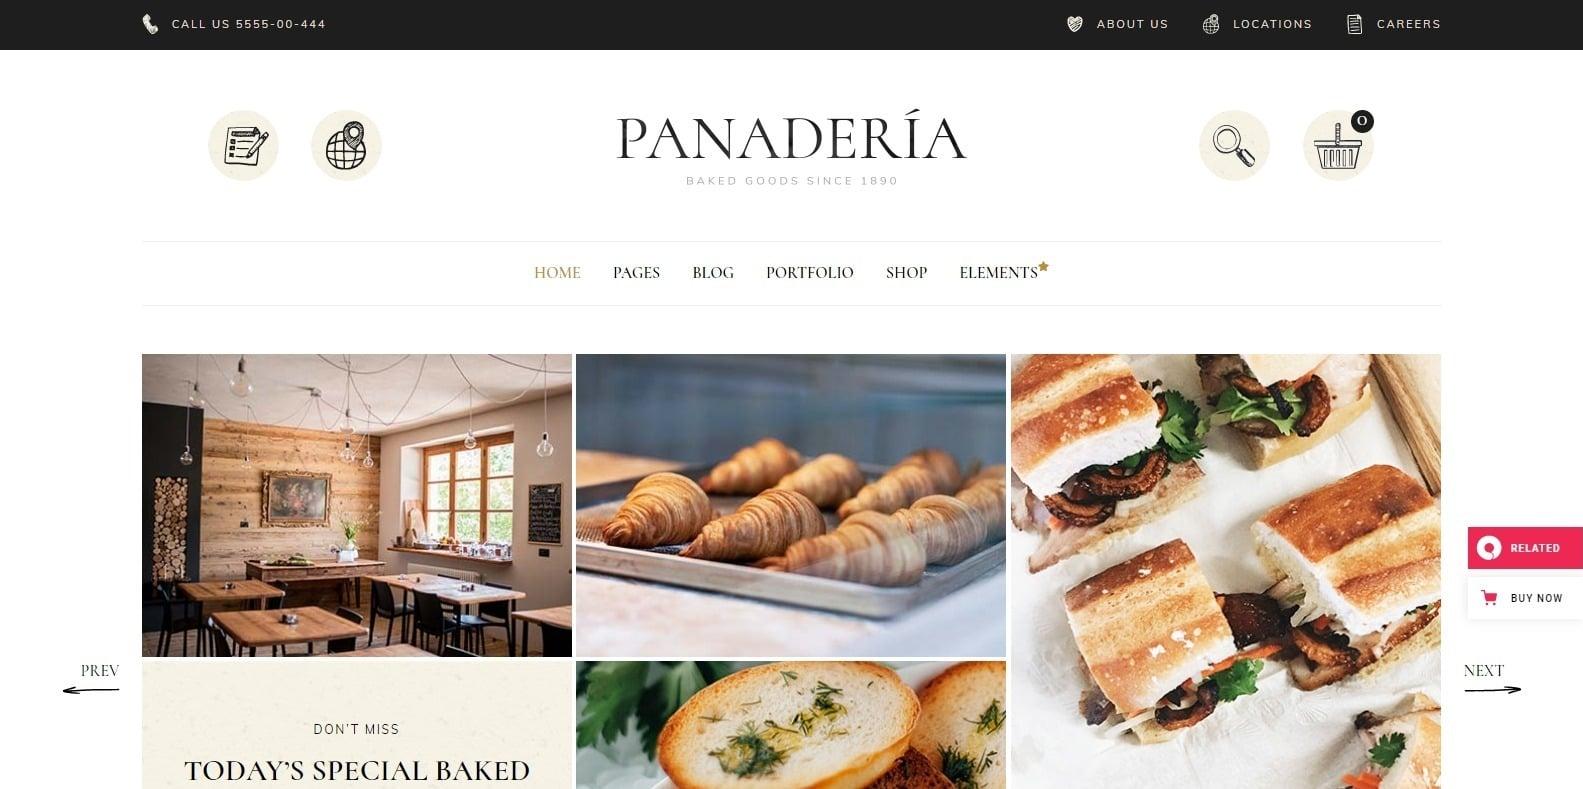 panaderia-coffee-shop-website-template